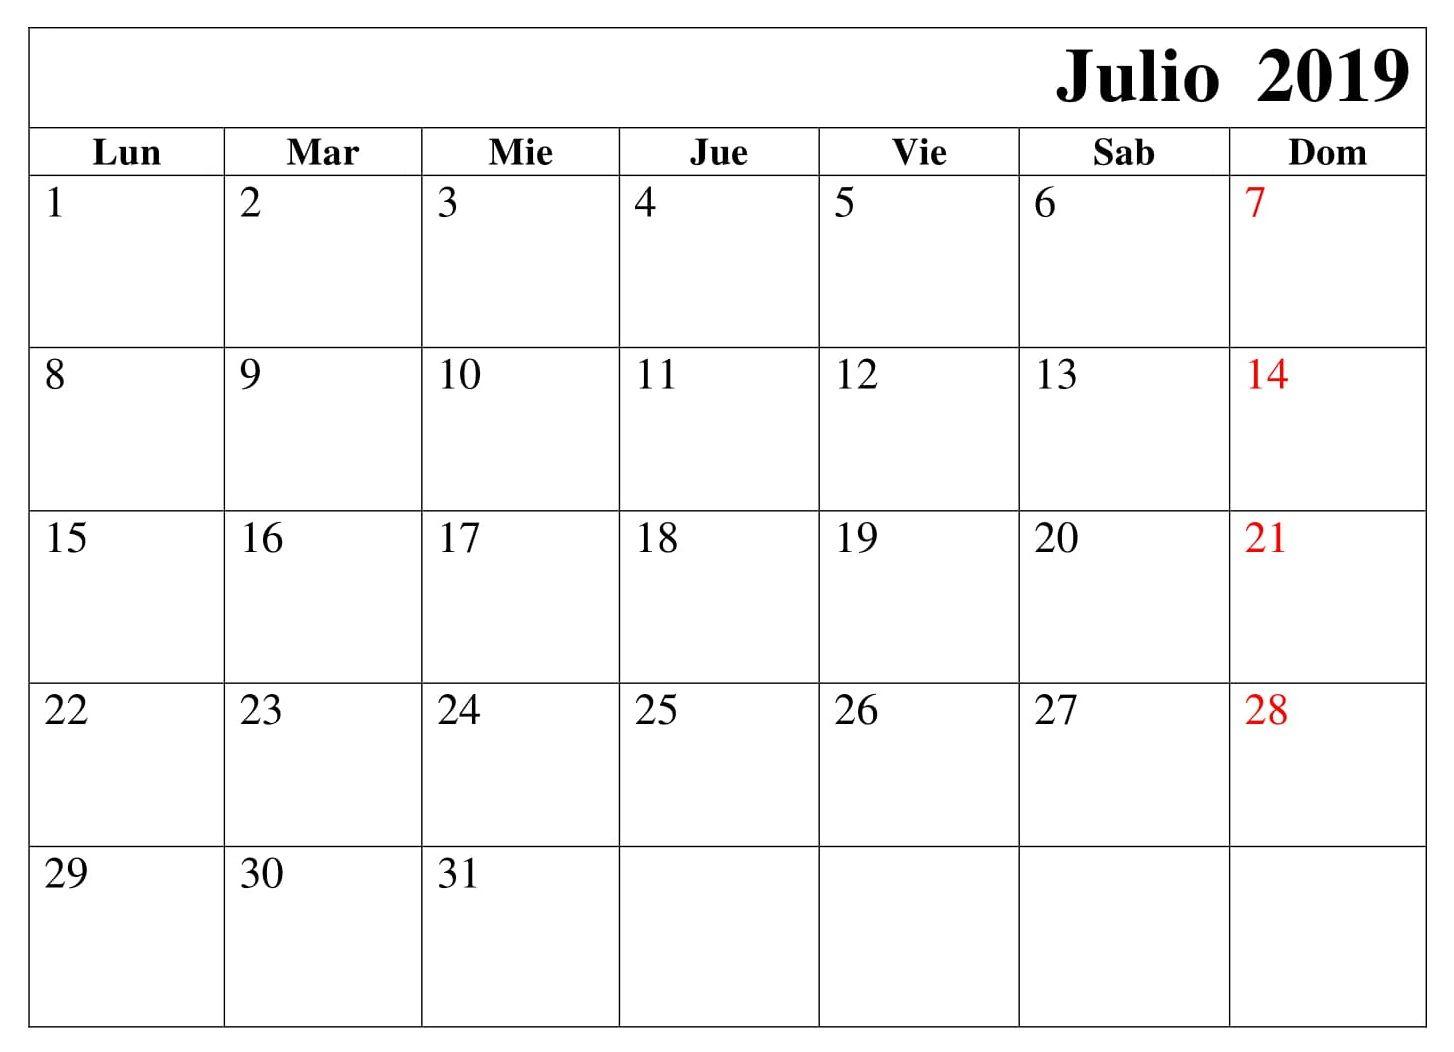 Mes De Julio Calendario.Julio Calendario Mes 2019 Para Imprimir Calendario Julio